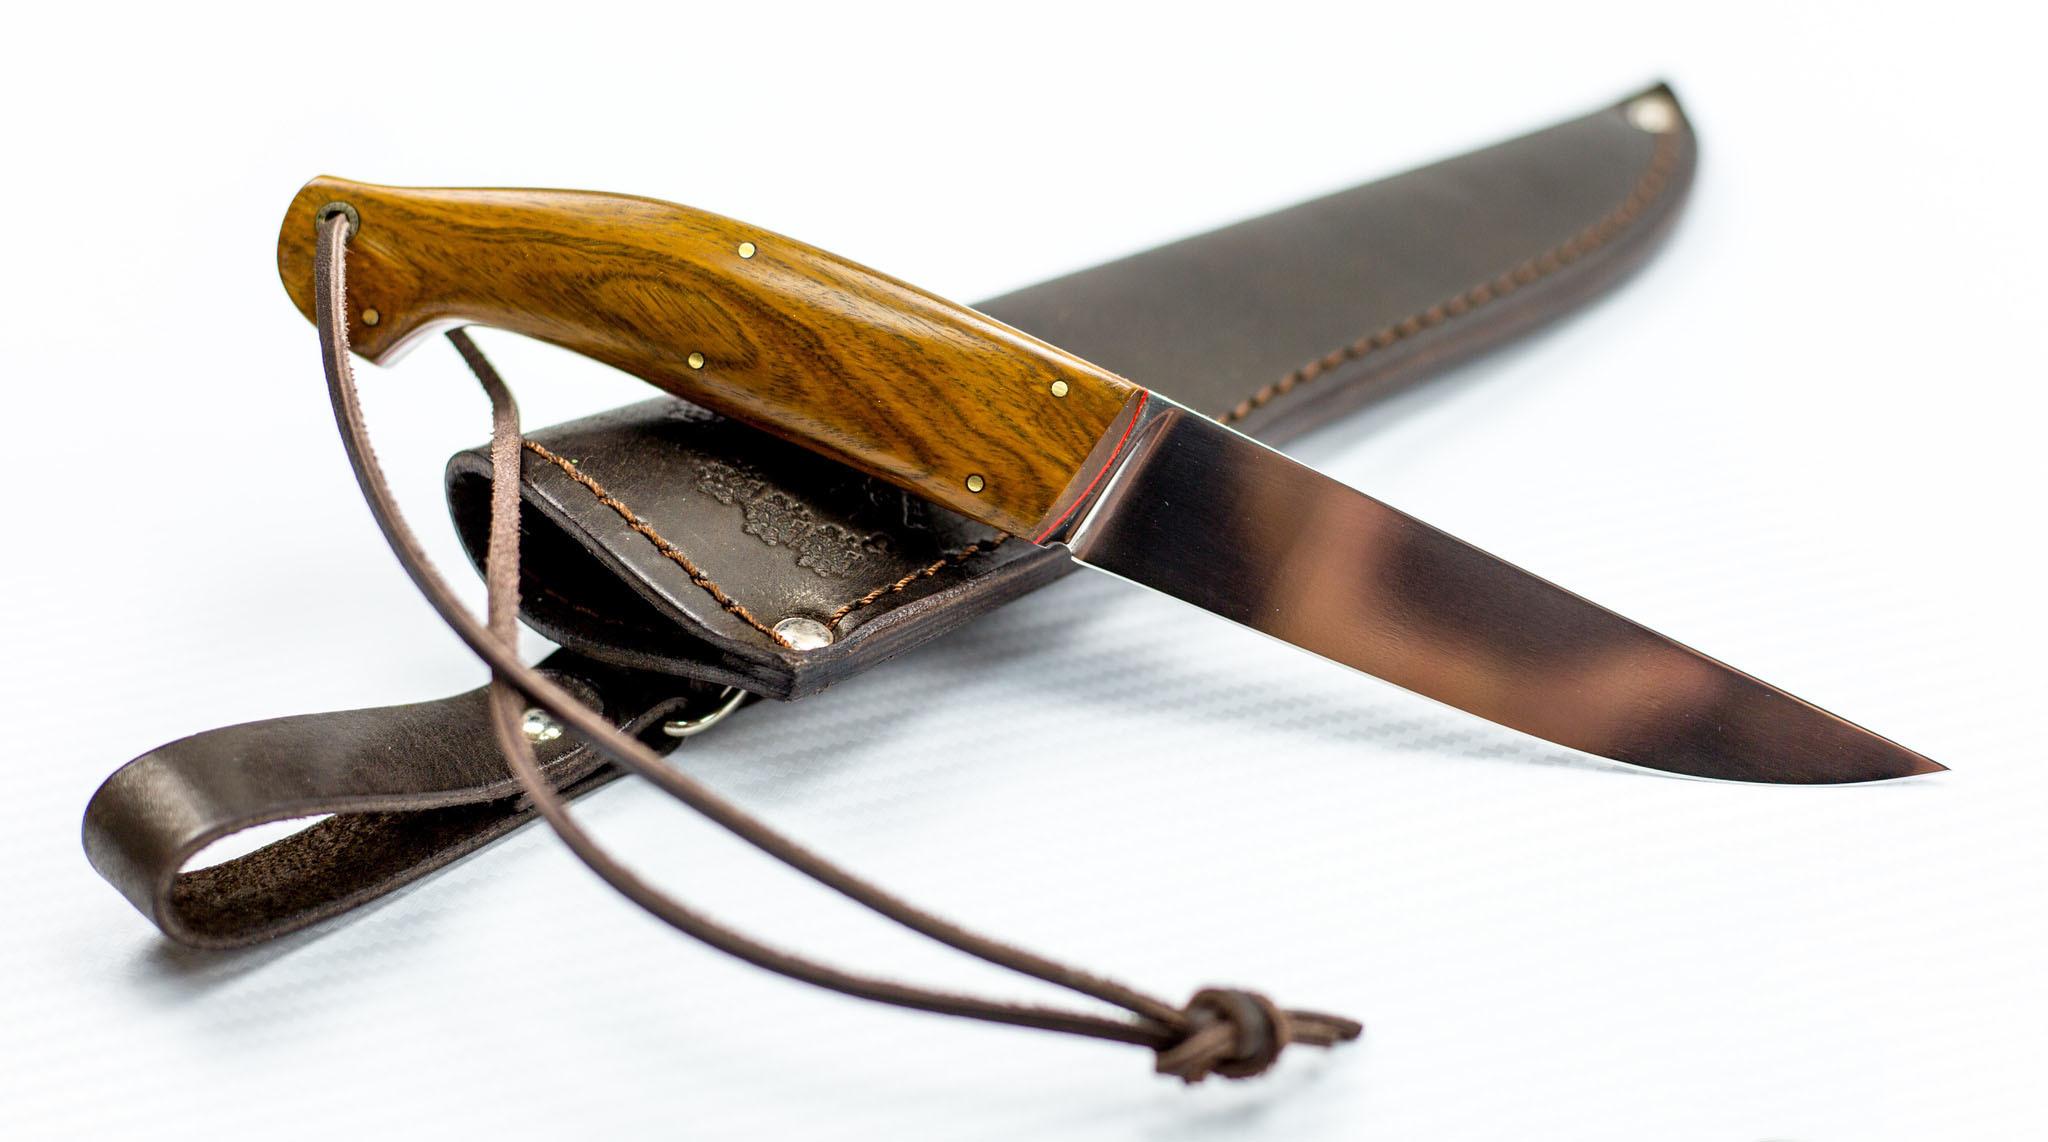 Нож Наваха, сталь Vanadis 10, рукоять дуб от Кузница Завьялова